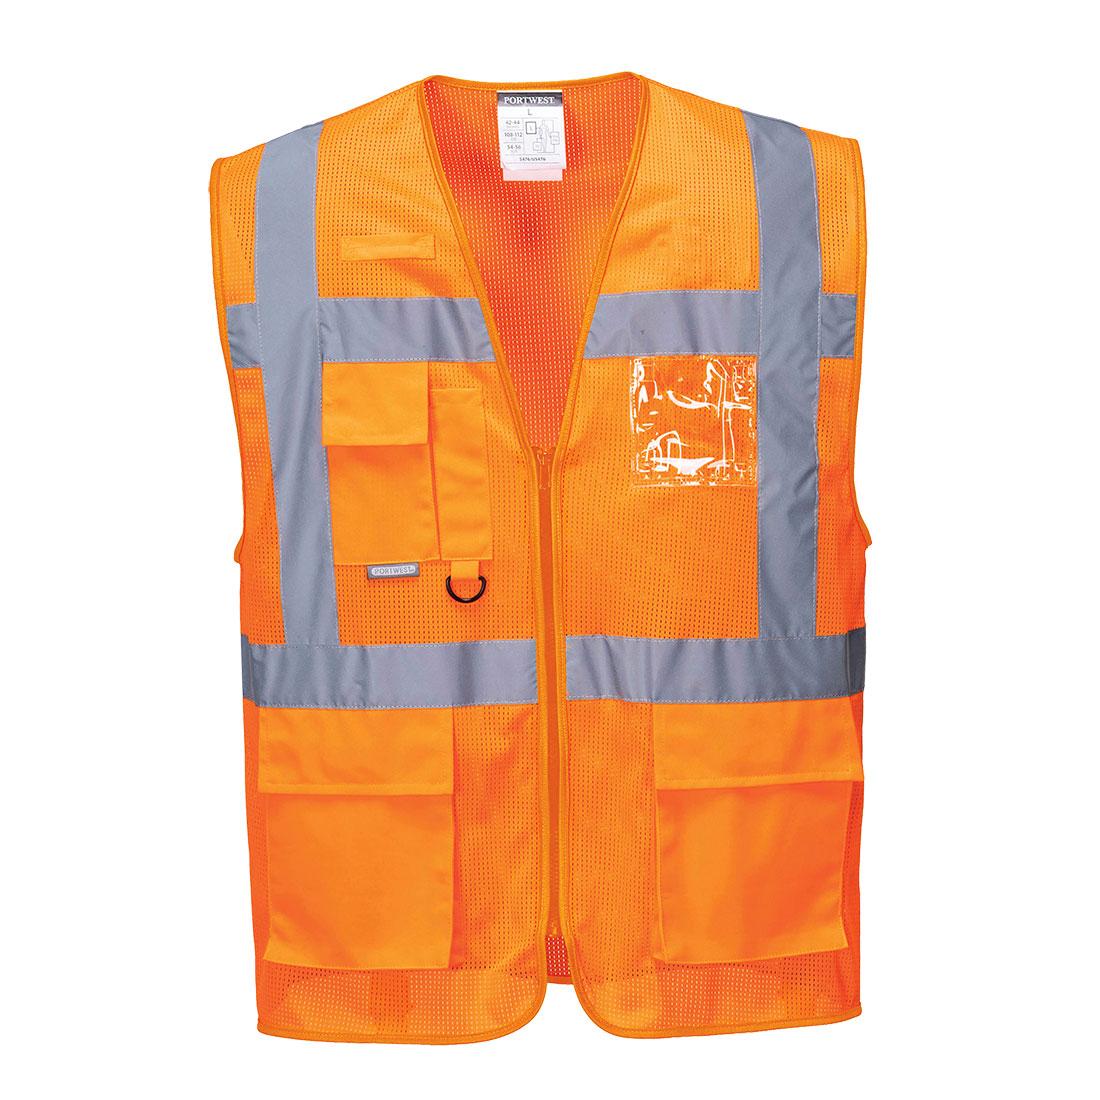 Athens MeshAir Executive Vest Orange MR